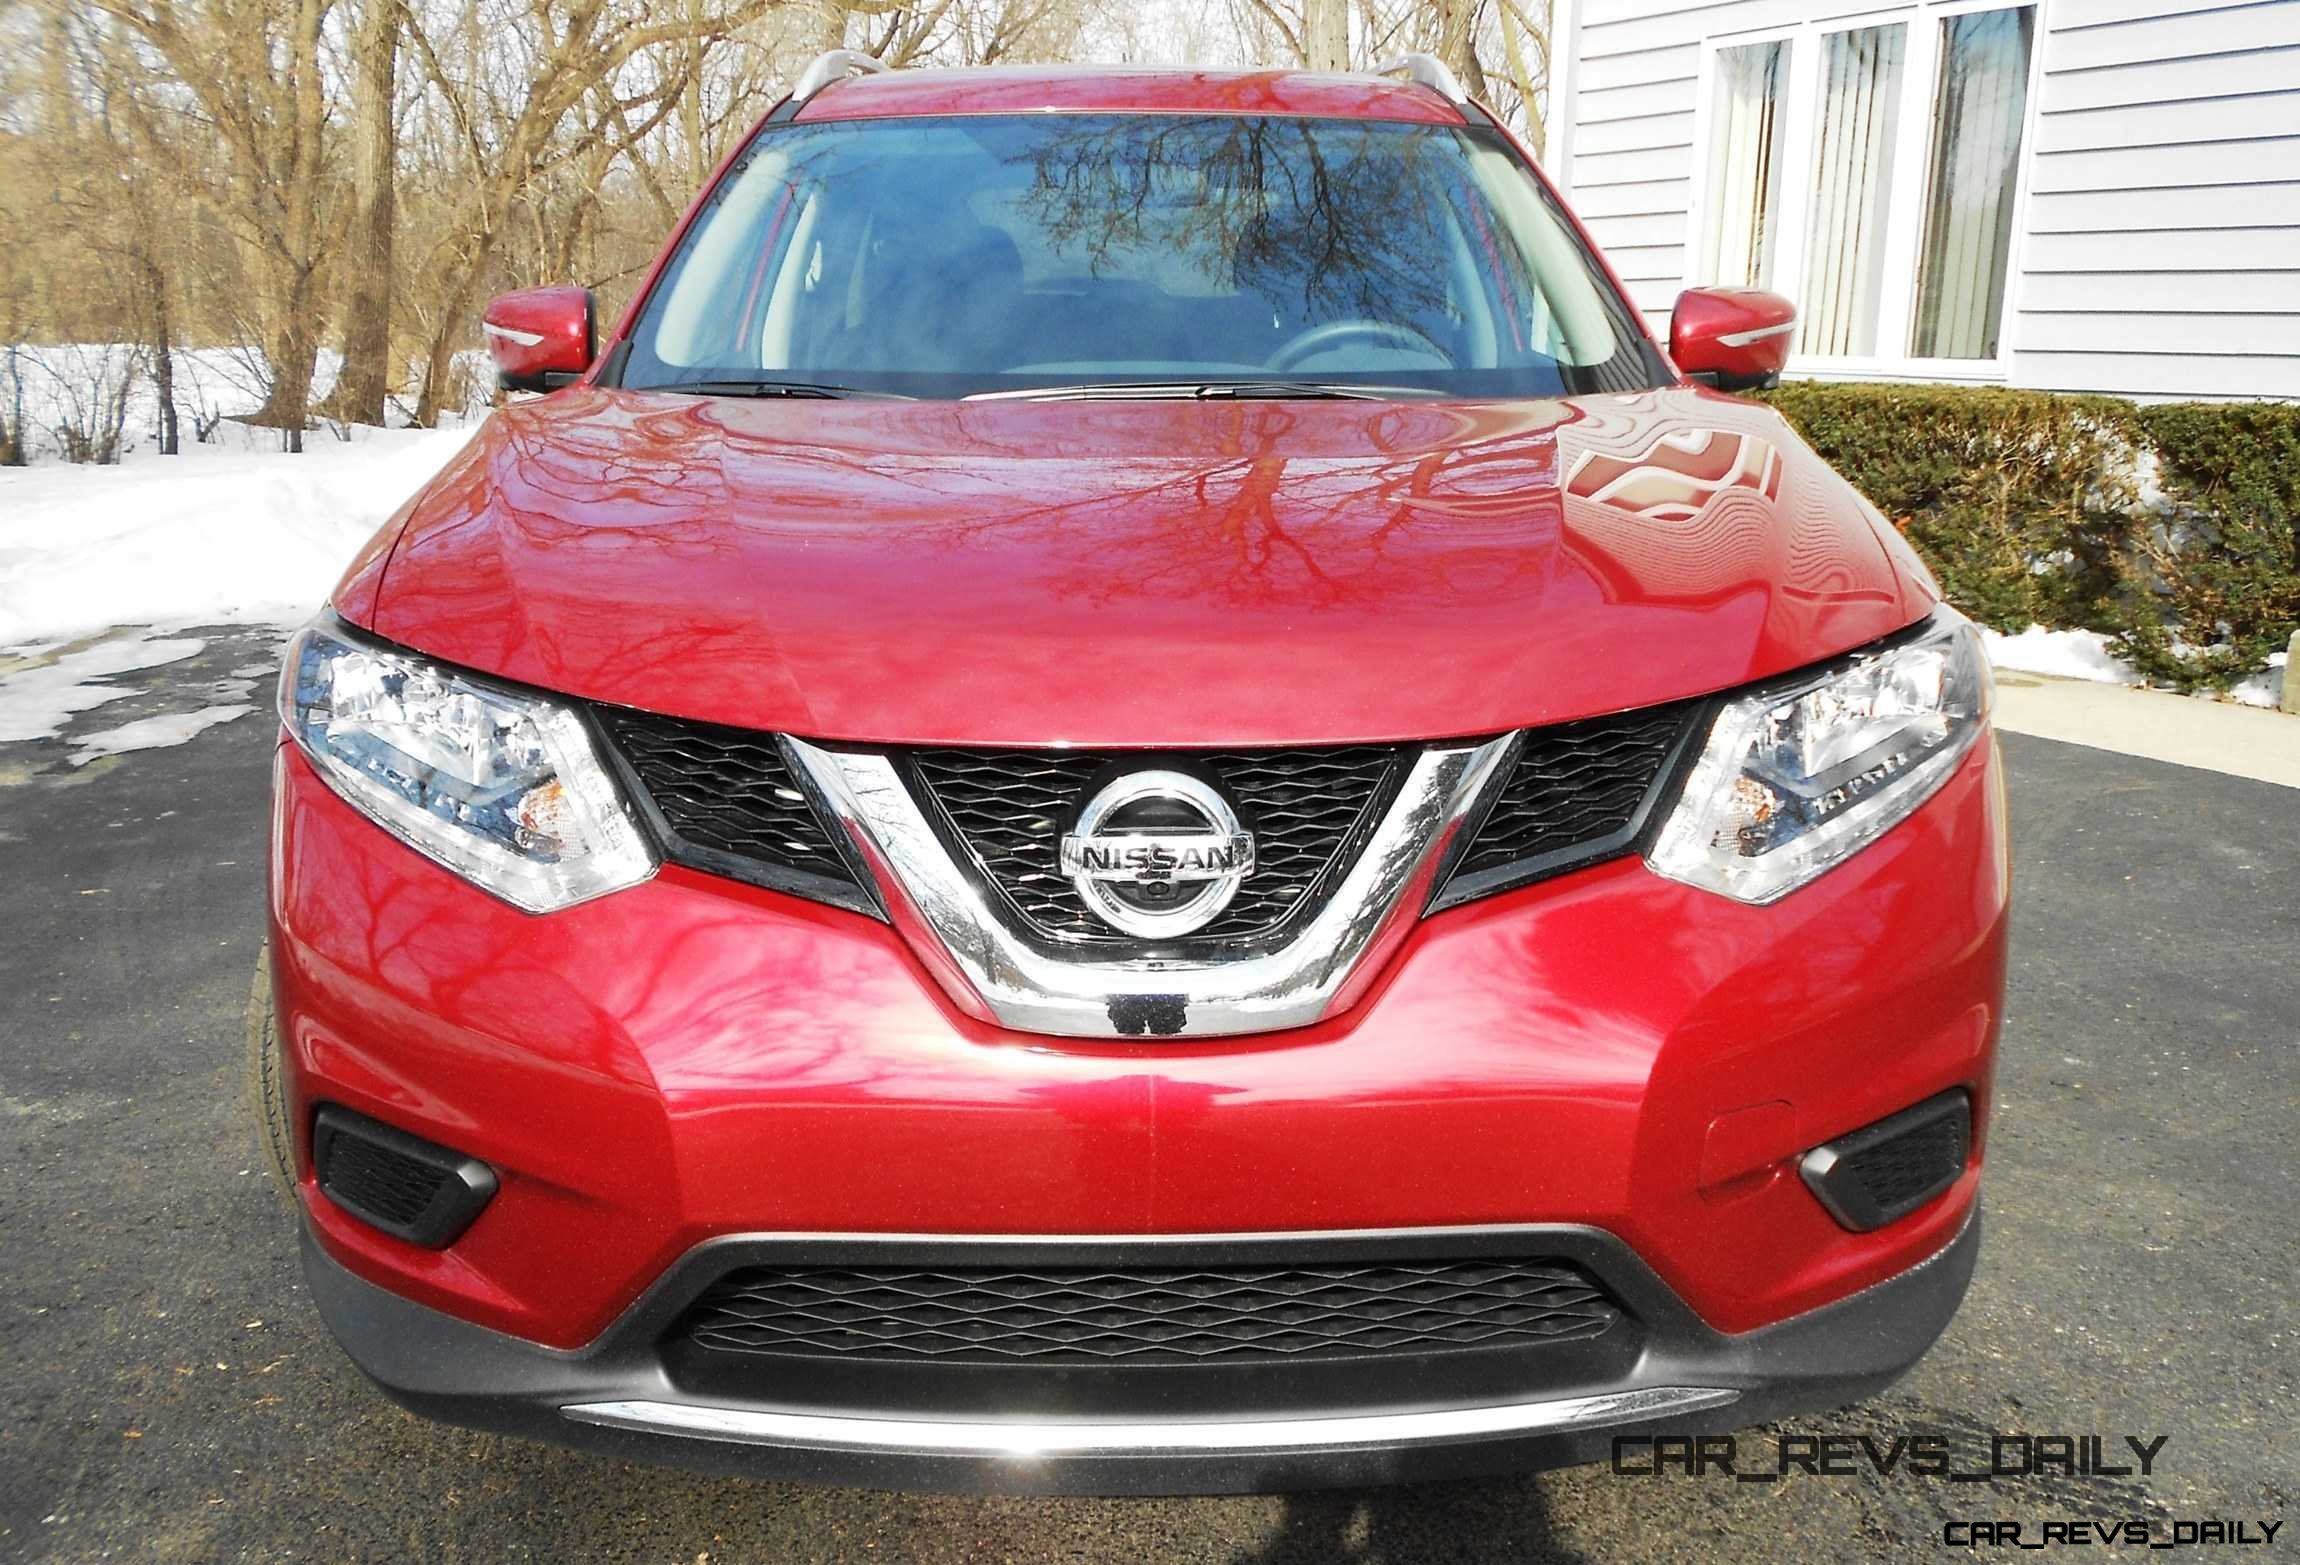 2015 Nissan Rogue 009